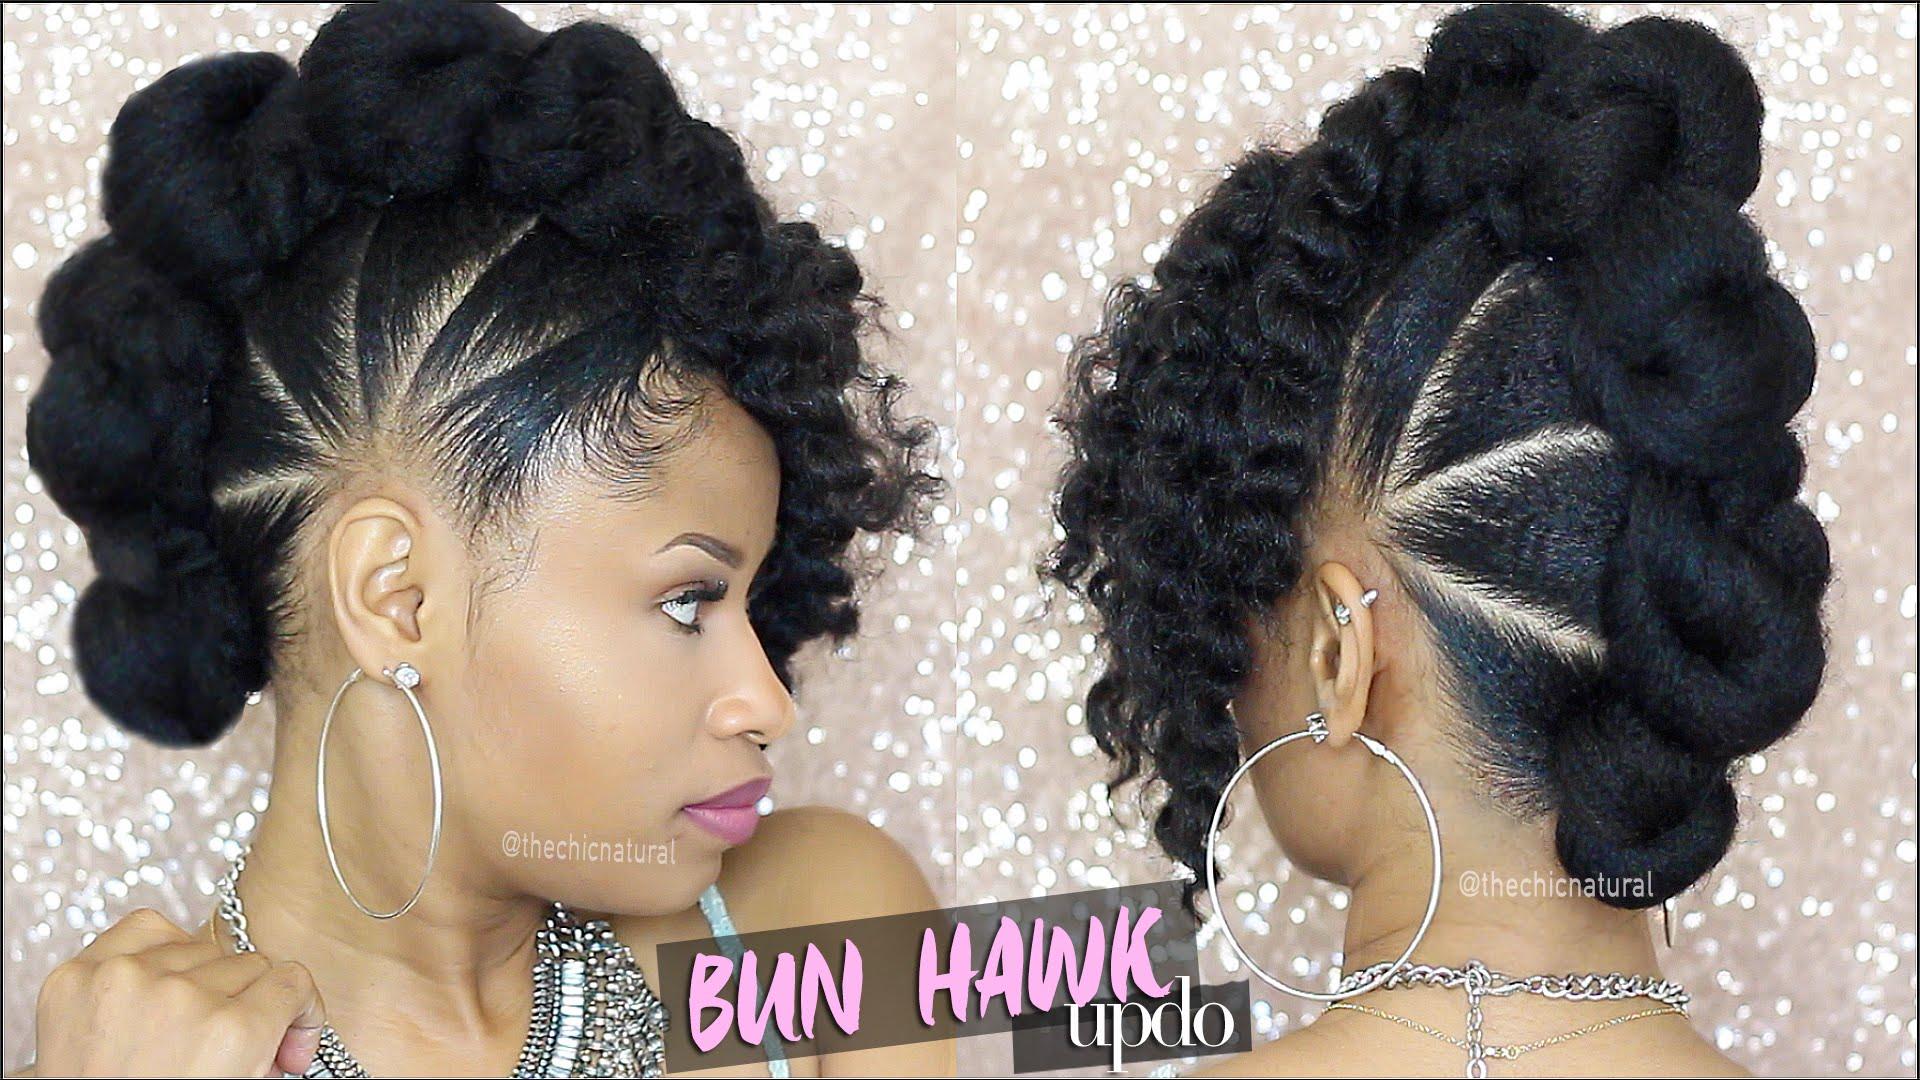 1503738236 Maxresdefault Jpg Everything Natural Hair